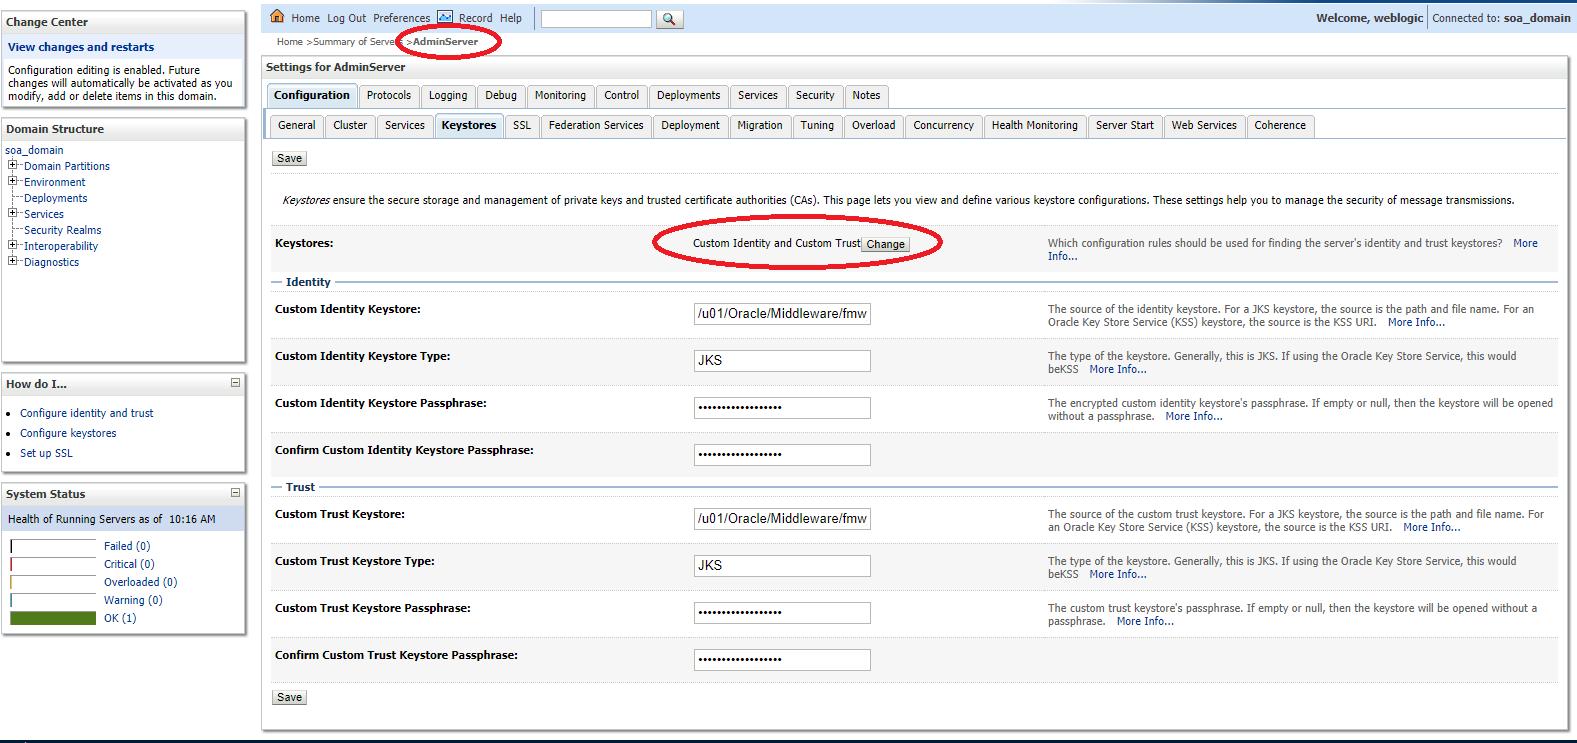 Integrate Weblogic With Active Directory Using LDAPS – Technology Geek